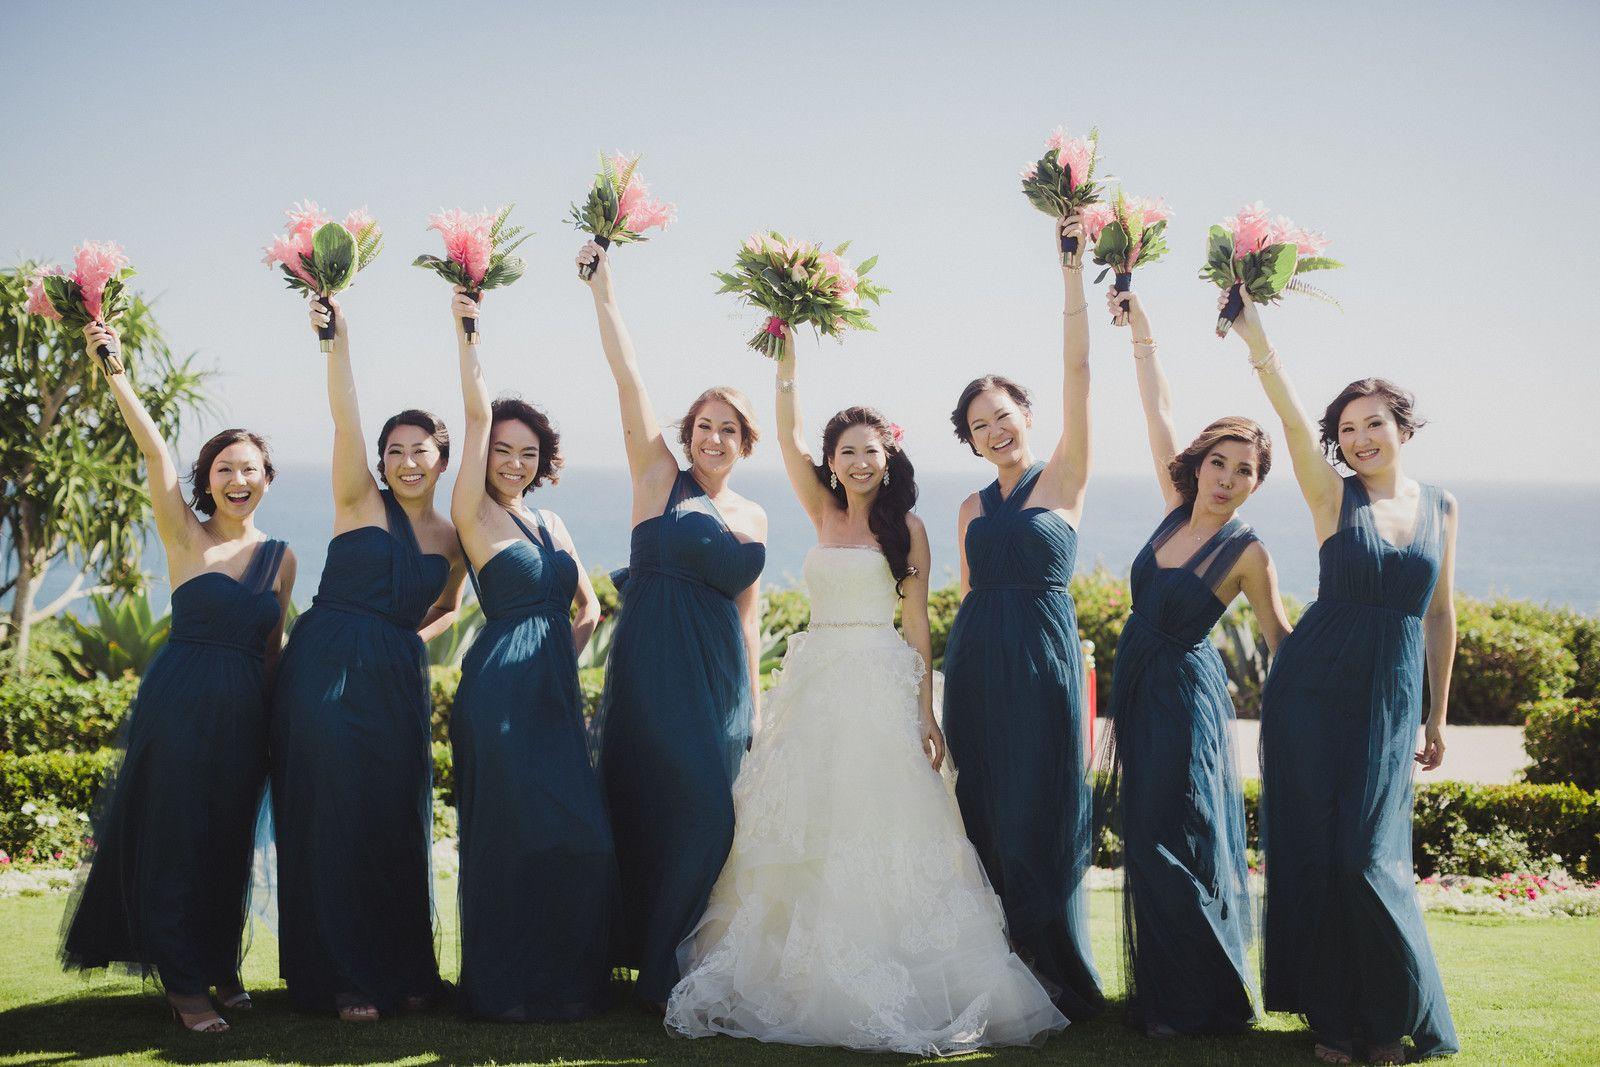 Lapis blue jenny yoo annabelle bridesmaid dresses with tropical lapis blue jenny yoo annabelle bridesmaid dresses with tropical flowers a montage hotel wedding in laguna ombrellifo Images